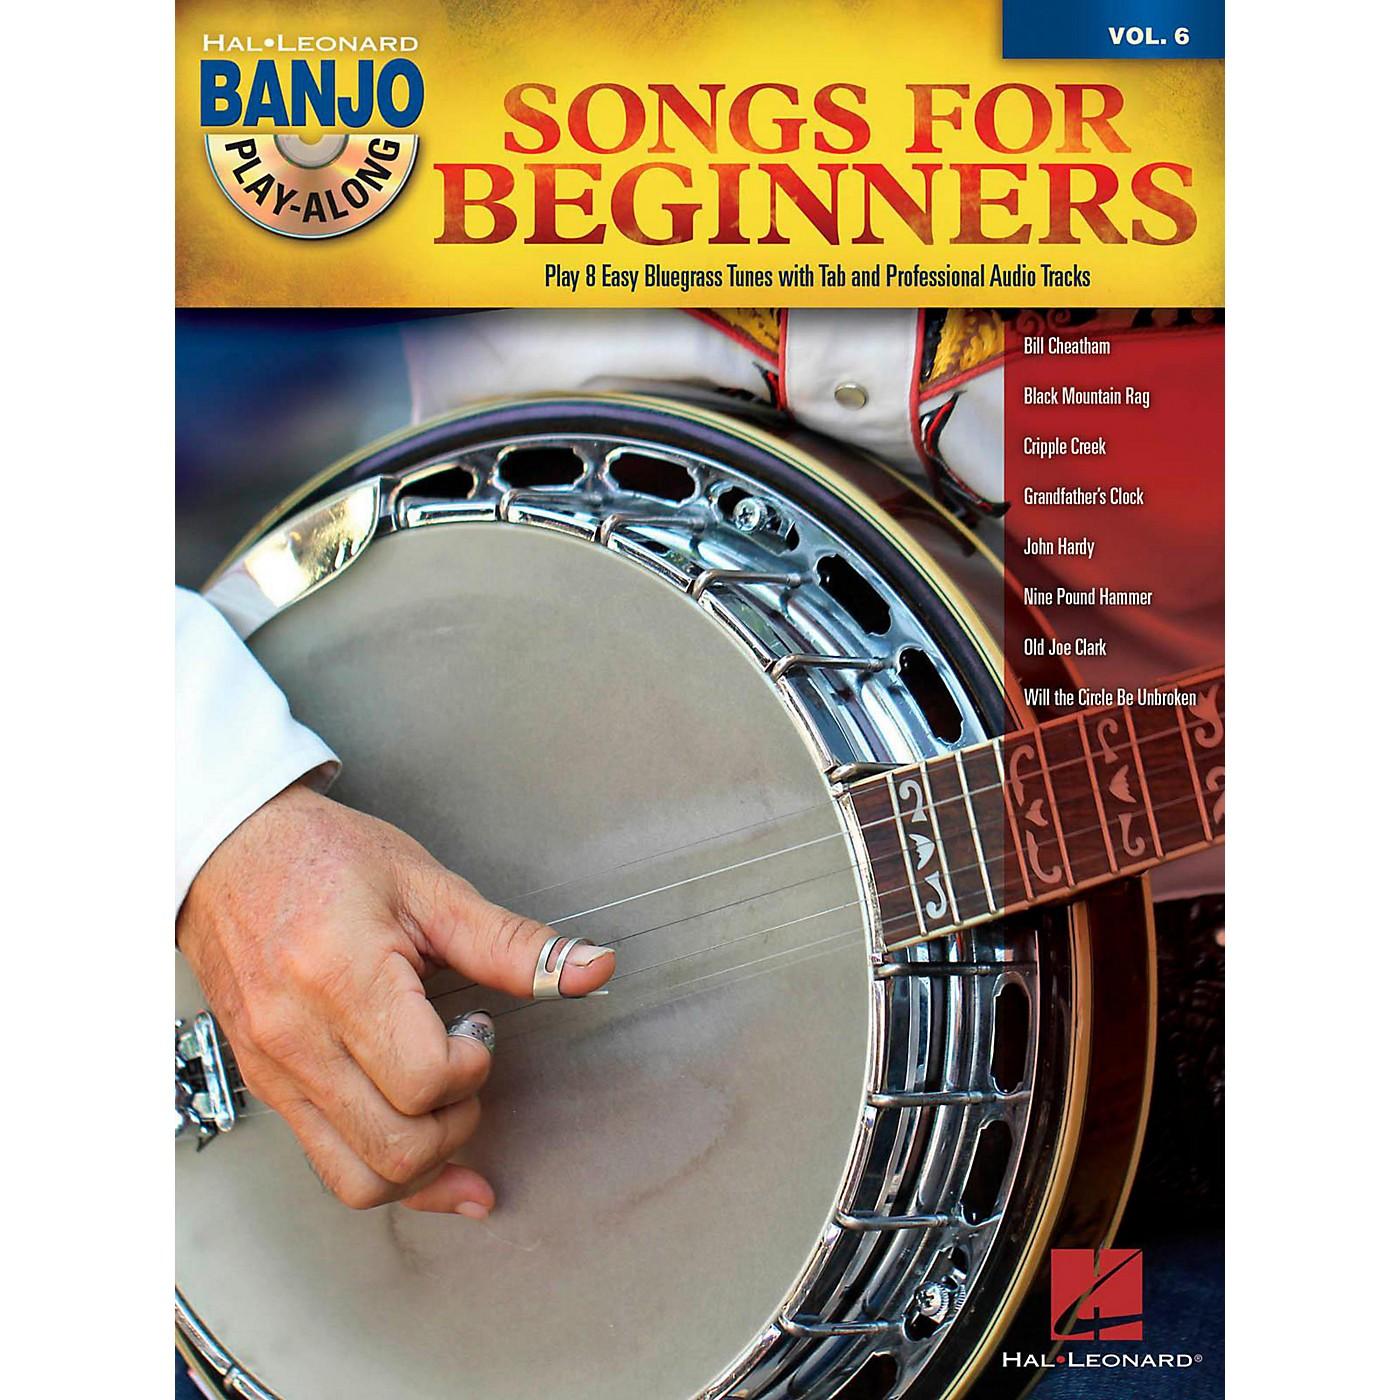 Hal Leonard Songs For Beginners - Banjo Play-Along Vol. 6 Book/CD thumbnail